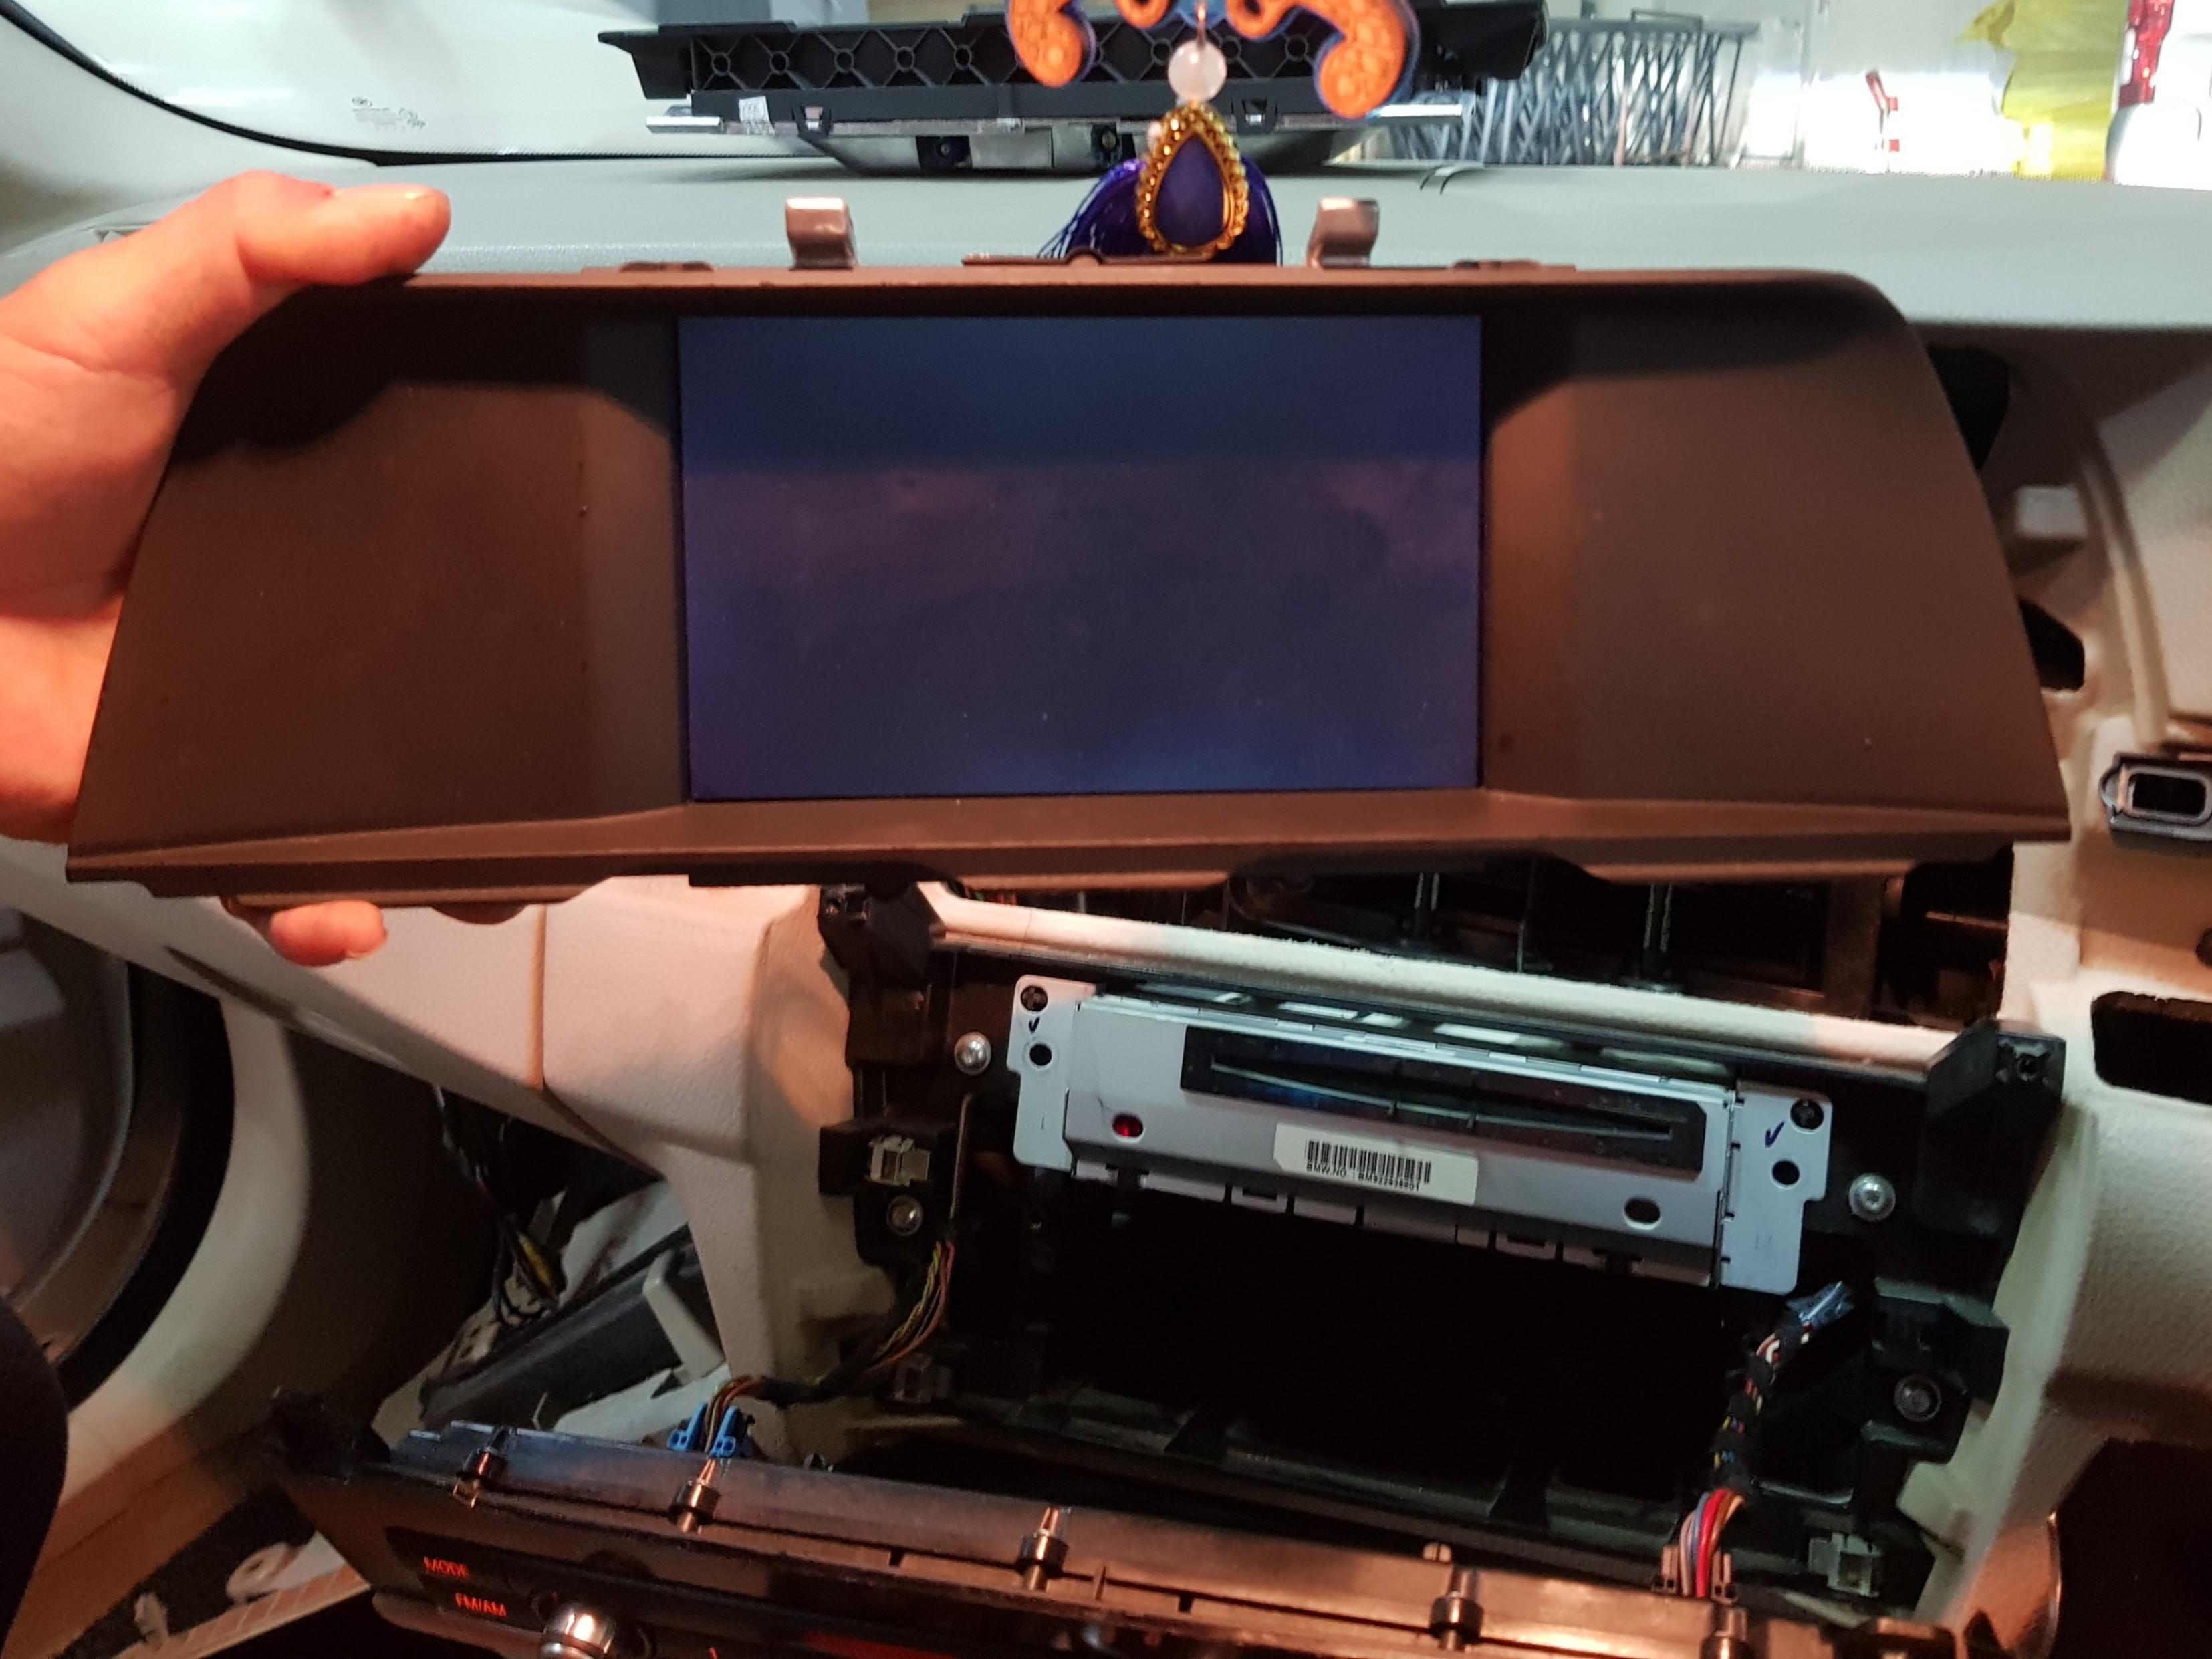 Bmw 523 F10 Tv monitor headunit